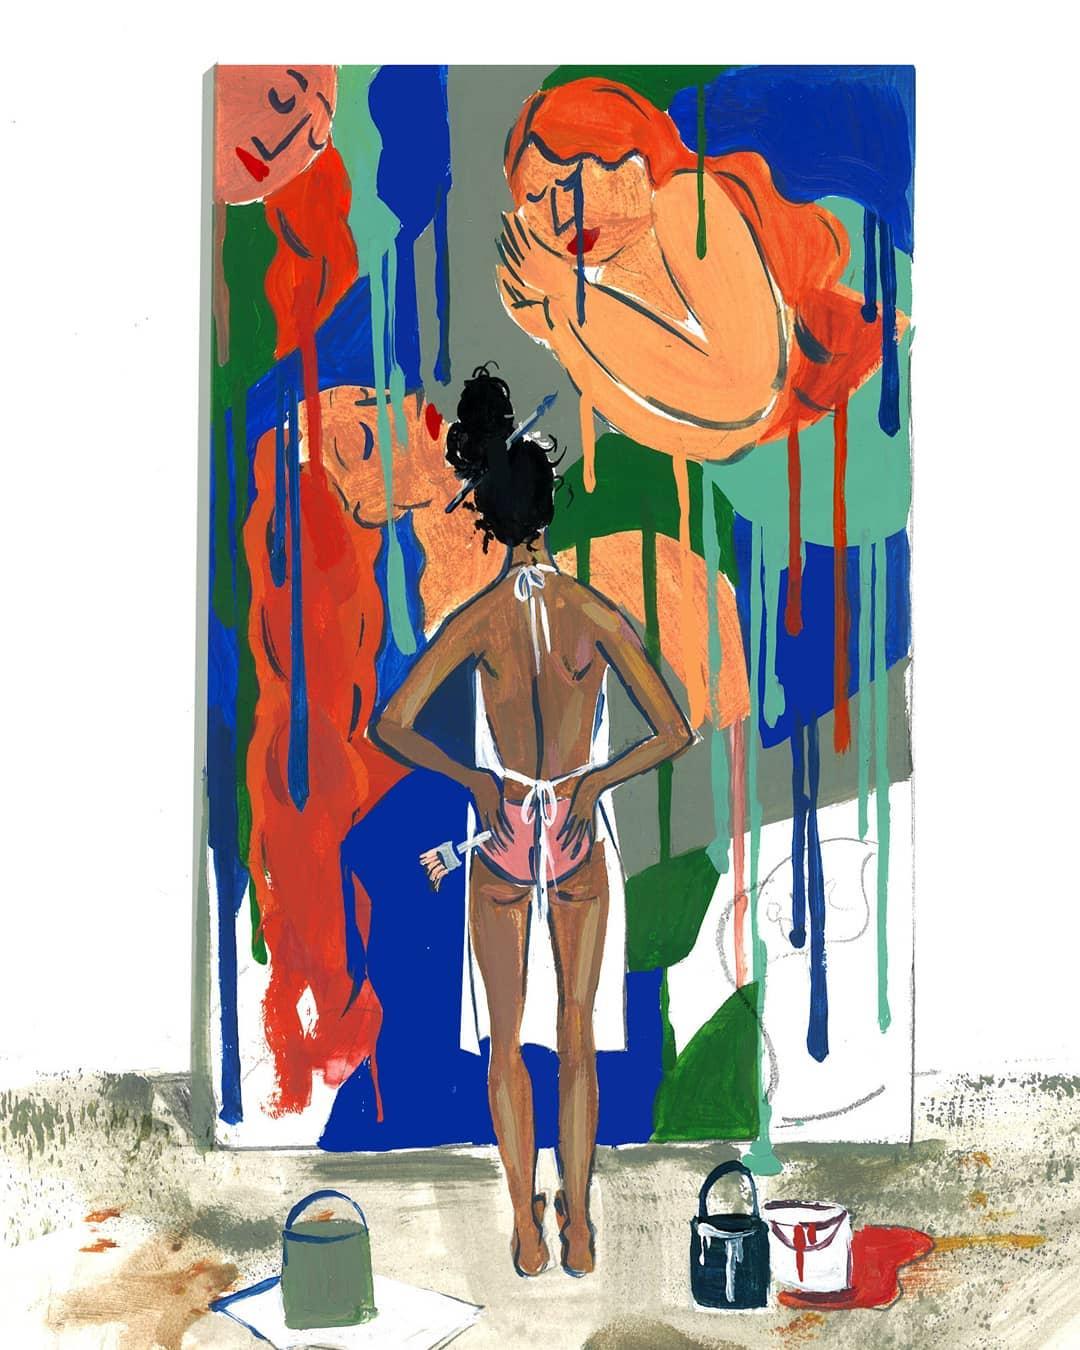 Illustration by Mokshini